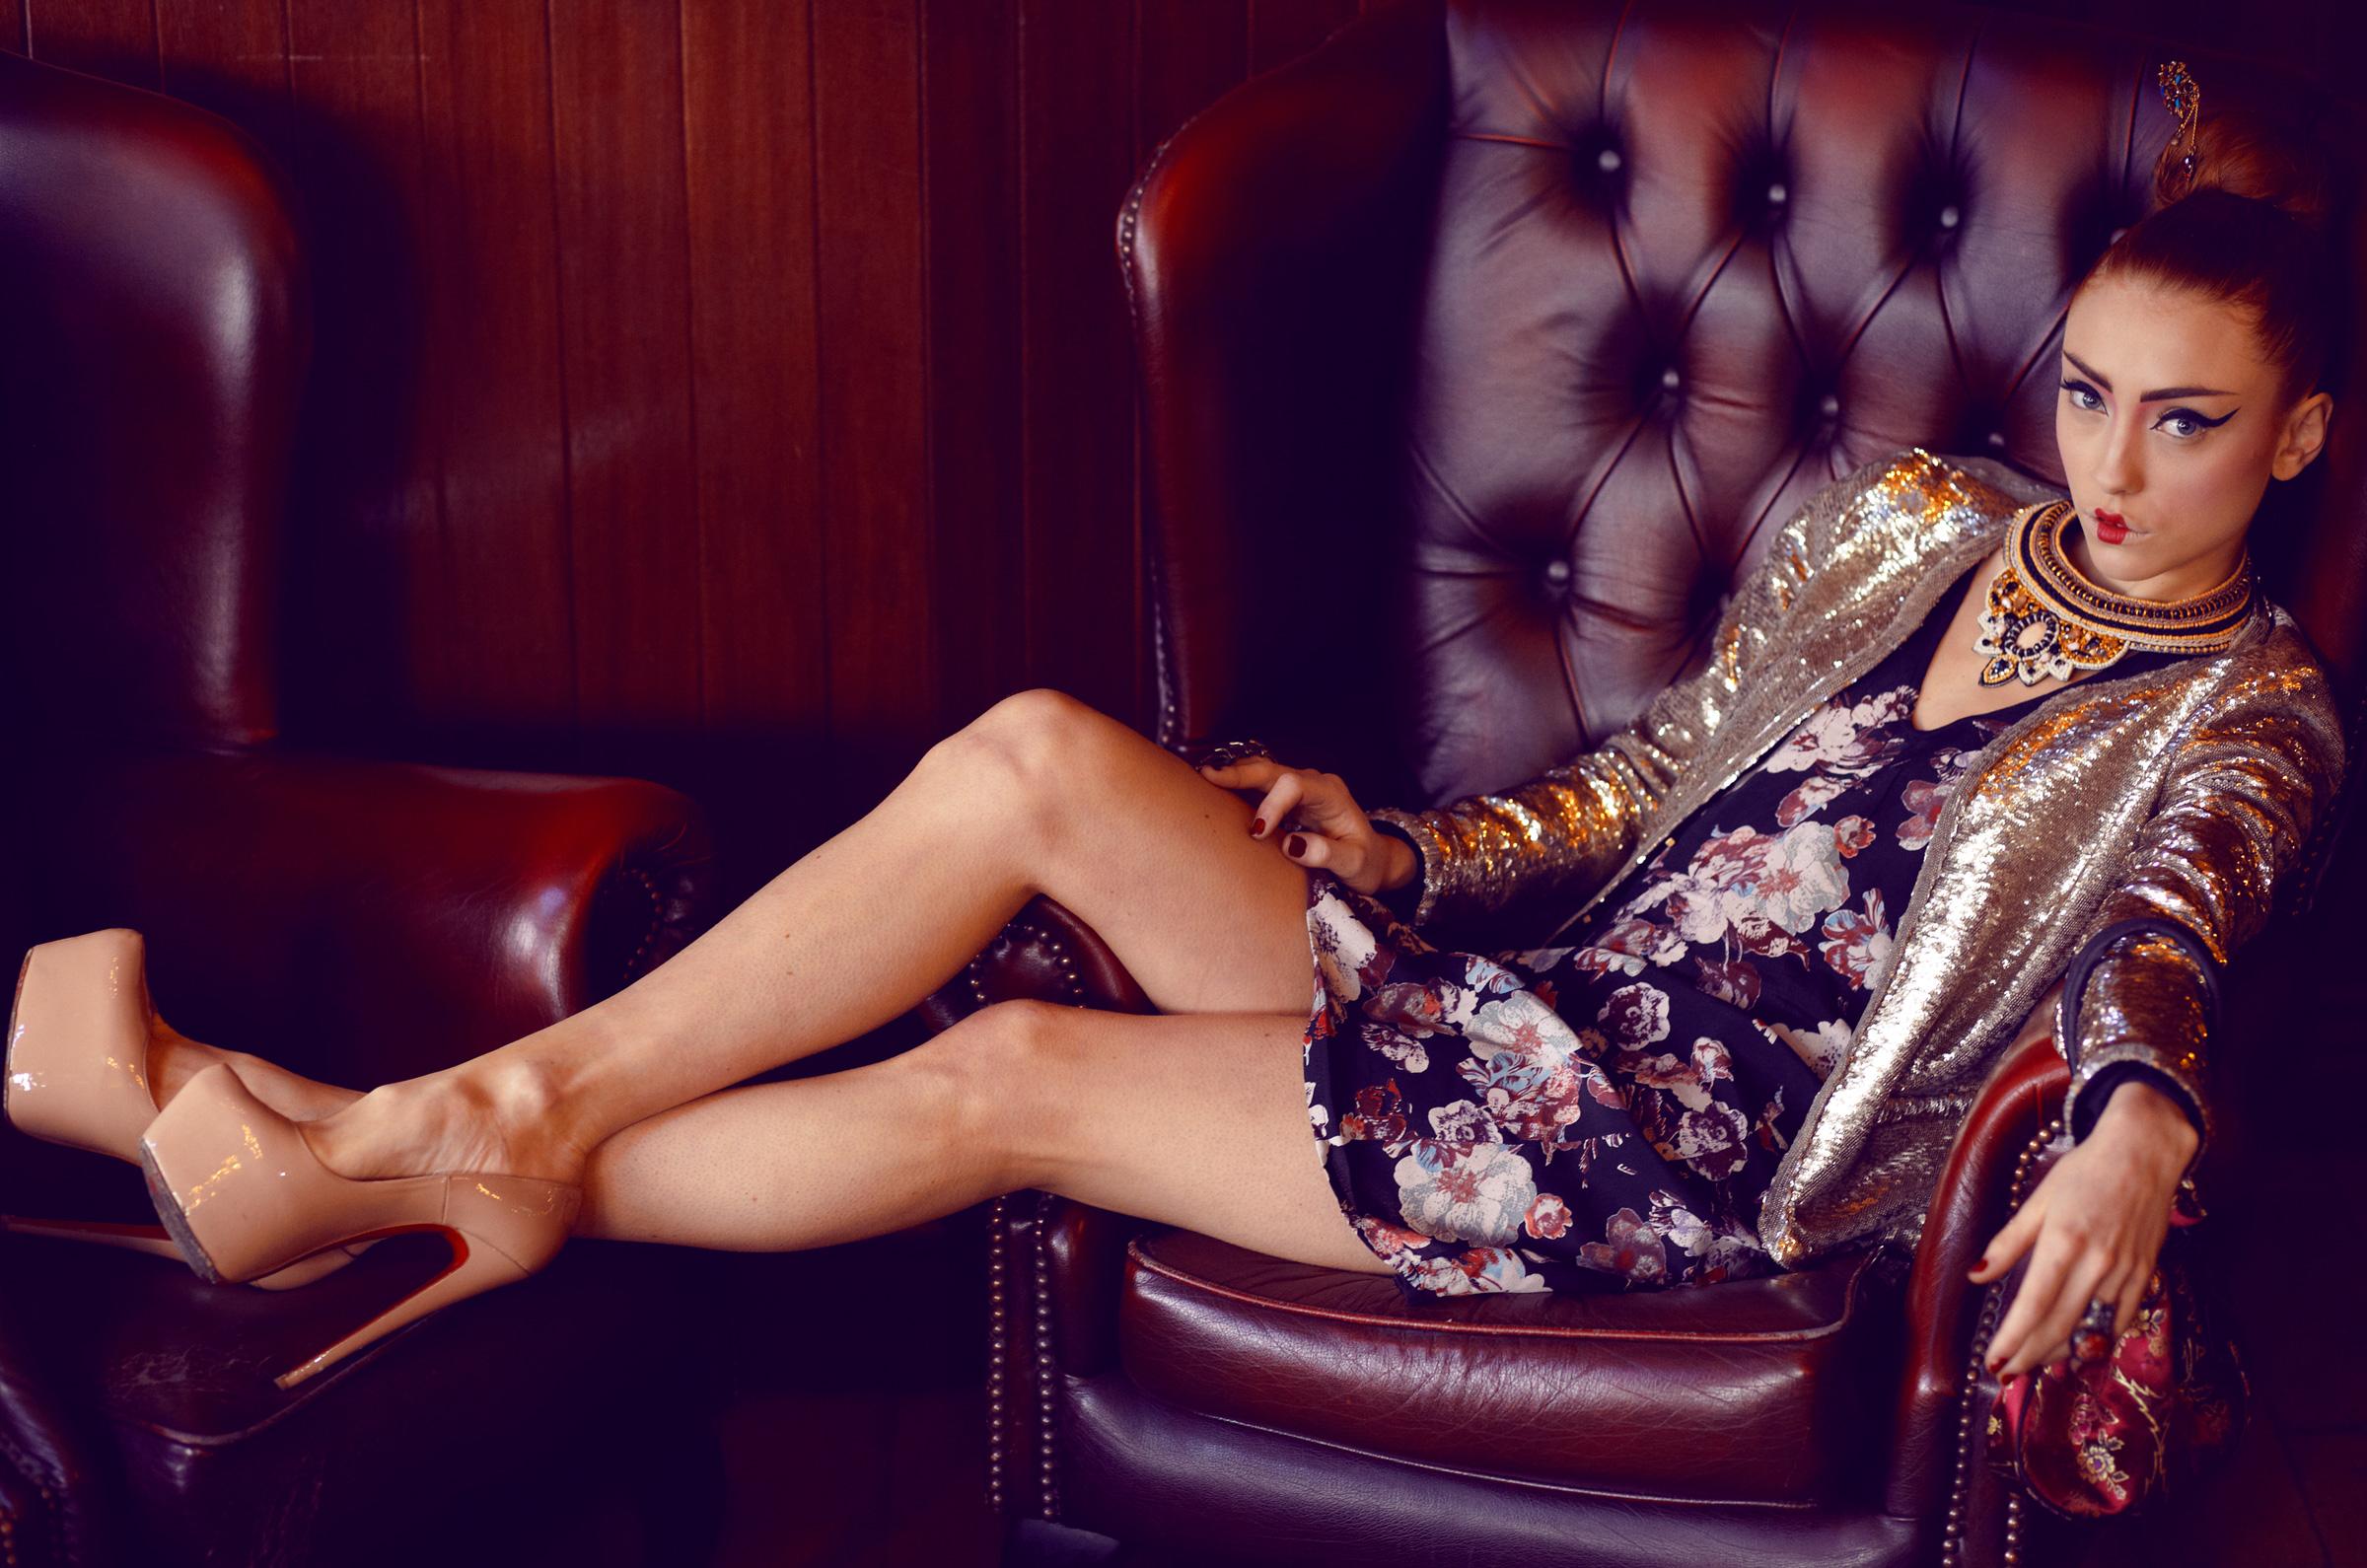 JC-GEISHA---RIO-DEBOLLA-Models1UK-Melissa-Uren-Photography-FEB-2014-LOOK-20633-FINAL-WEB-V2.jpg